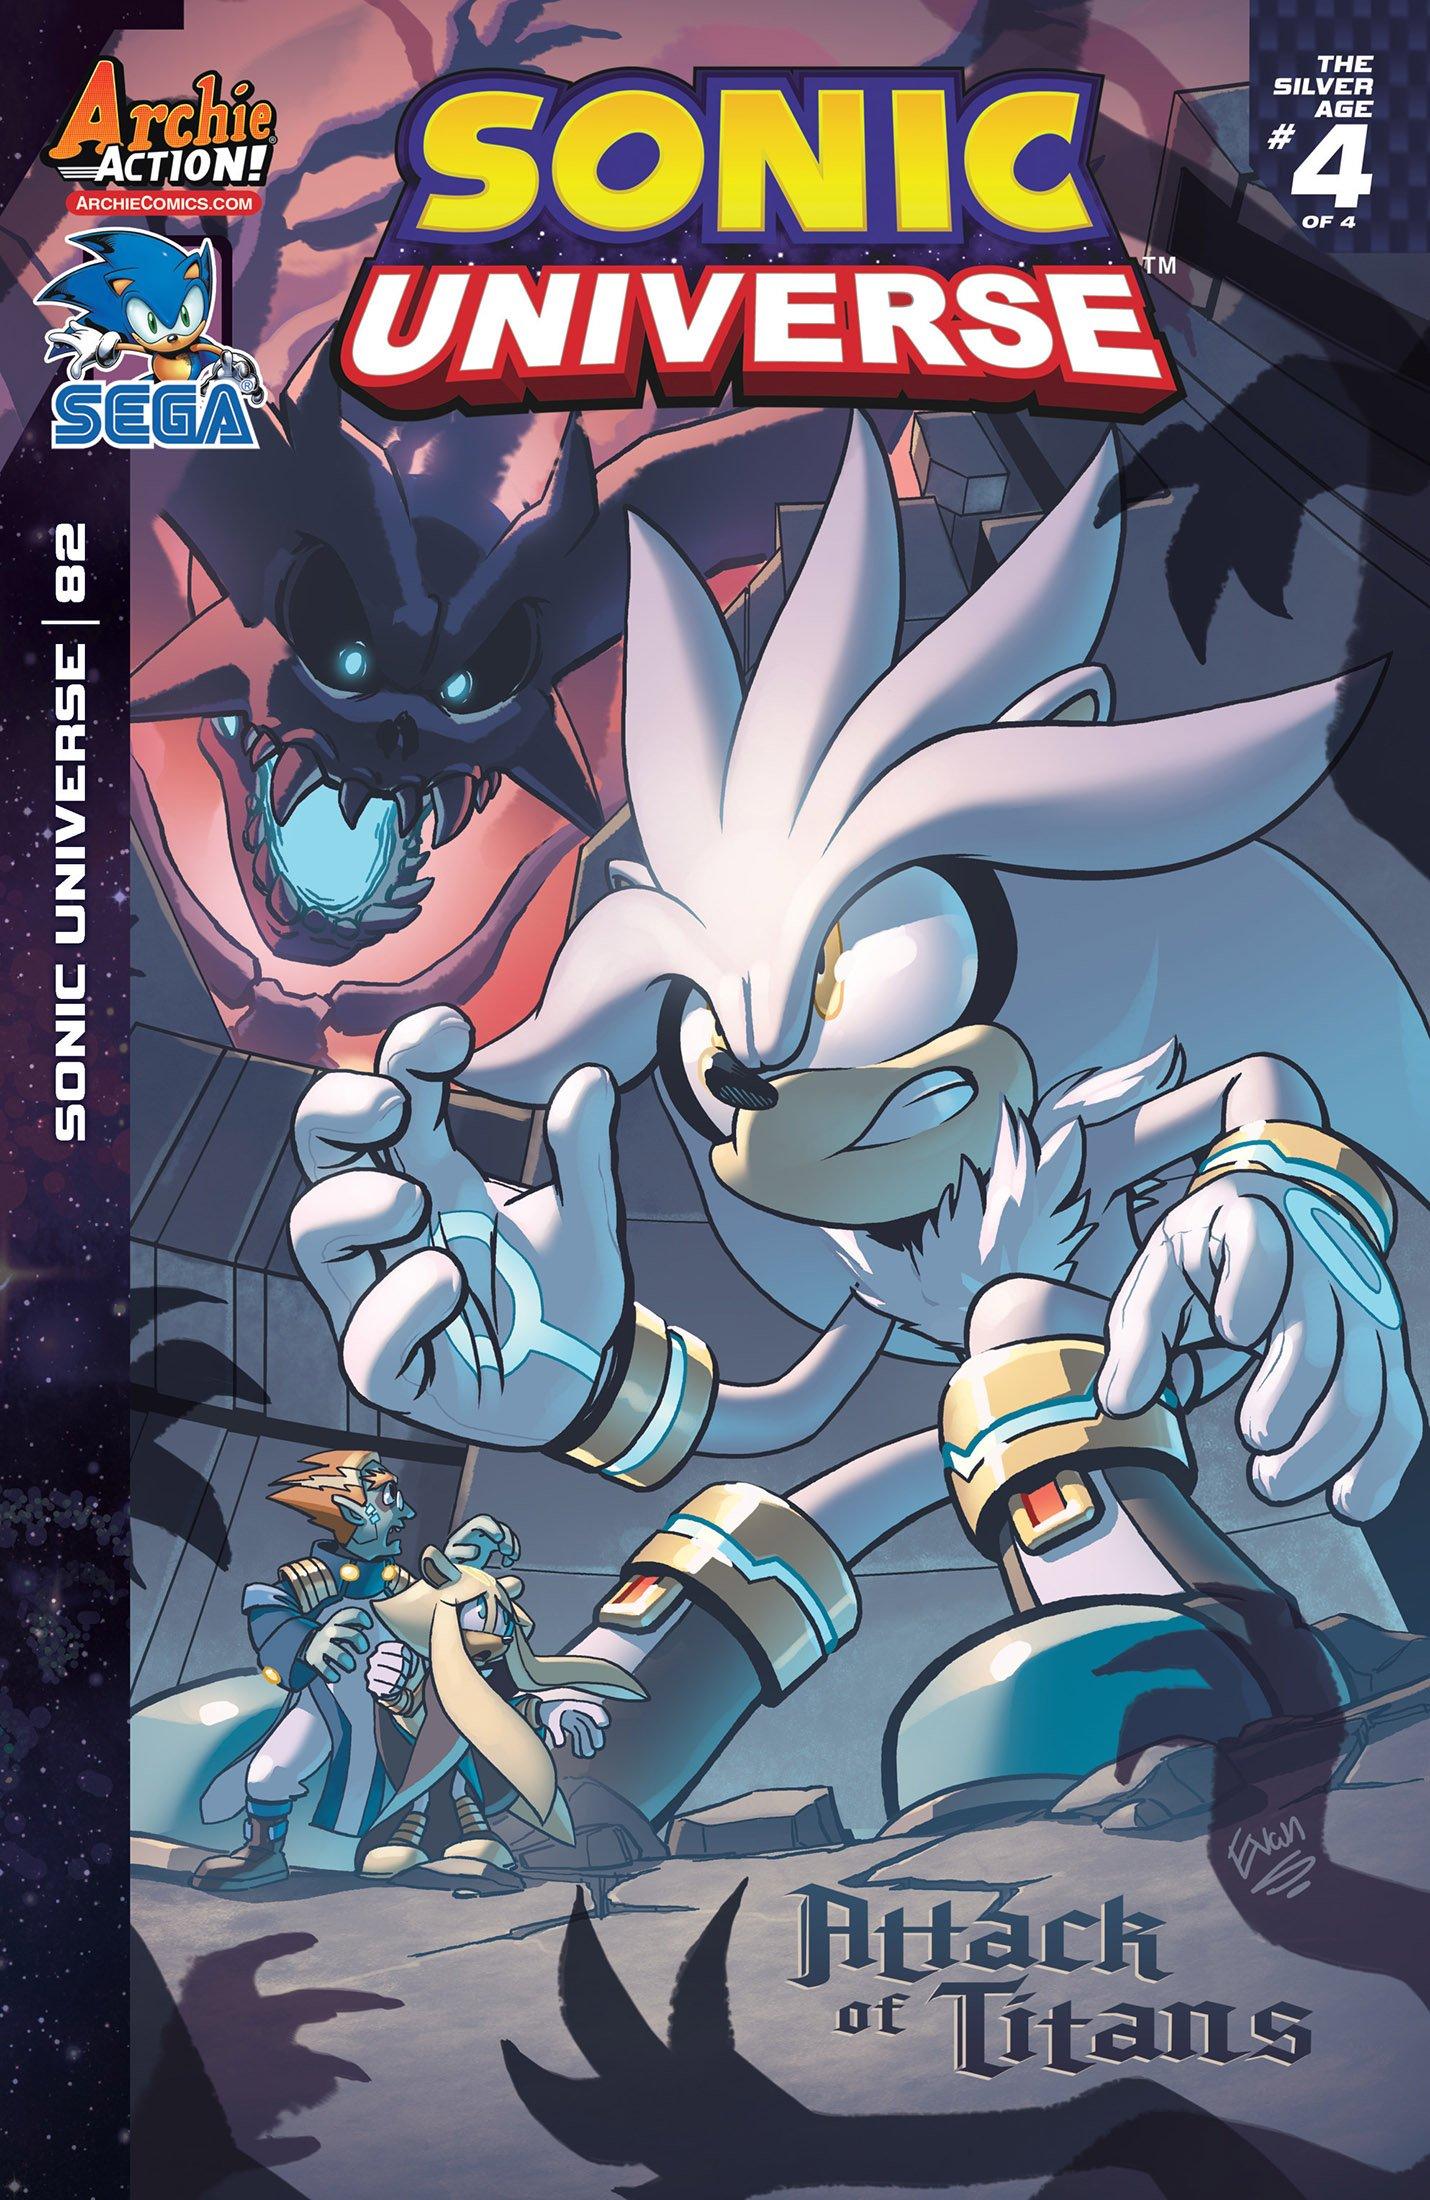 Sonic Universe 082 (January 2016)